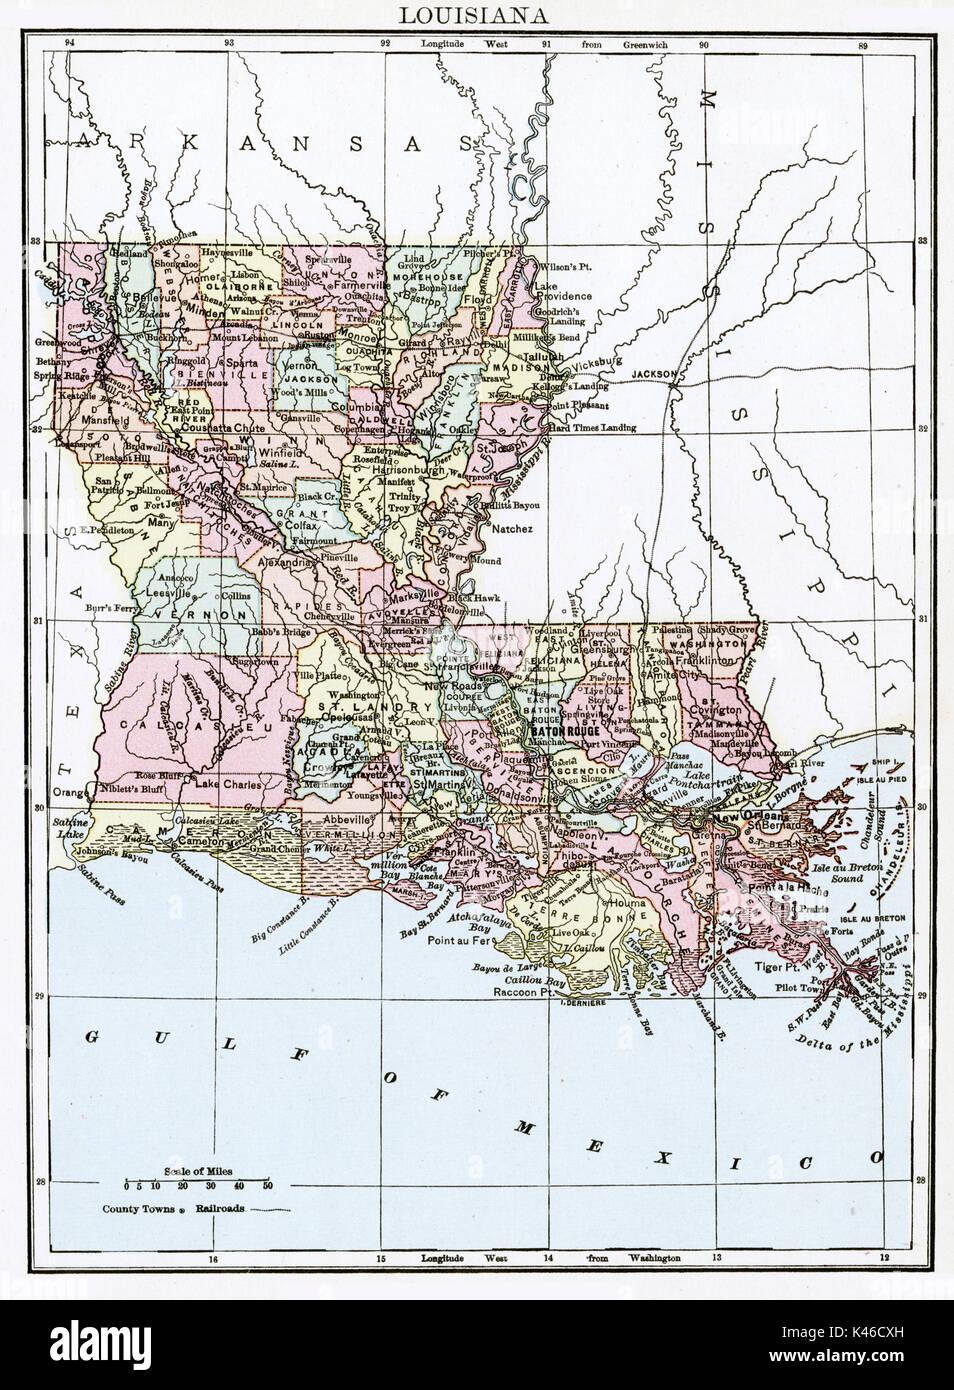 Shreveport Louisiana Area Map Stock map makers